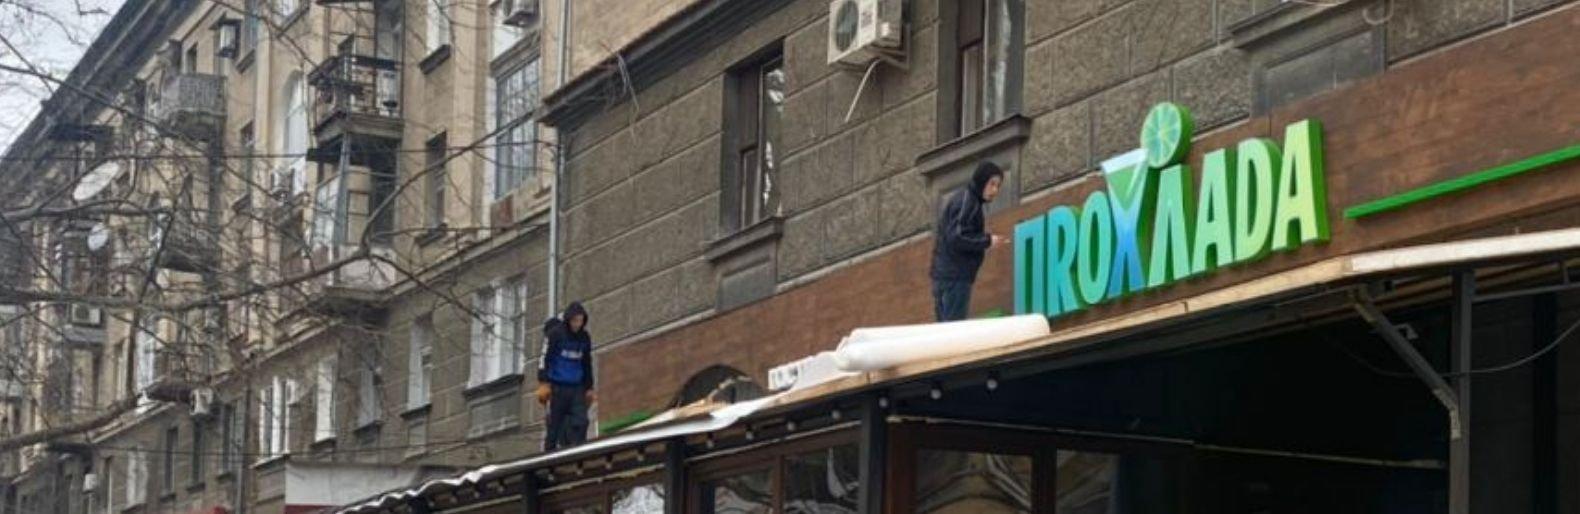 В Николаеве незаконно застеклили летнюю площадку возле кафе, - ФОТО